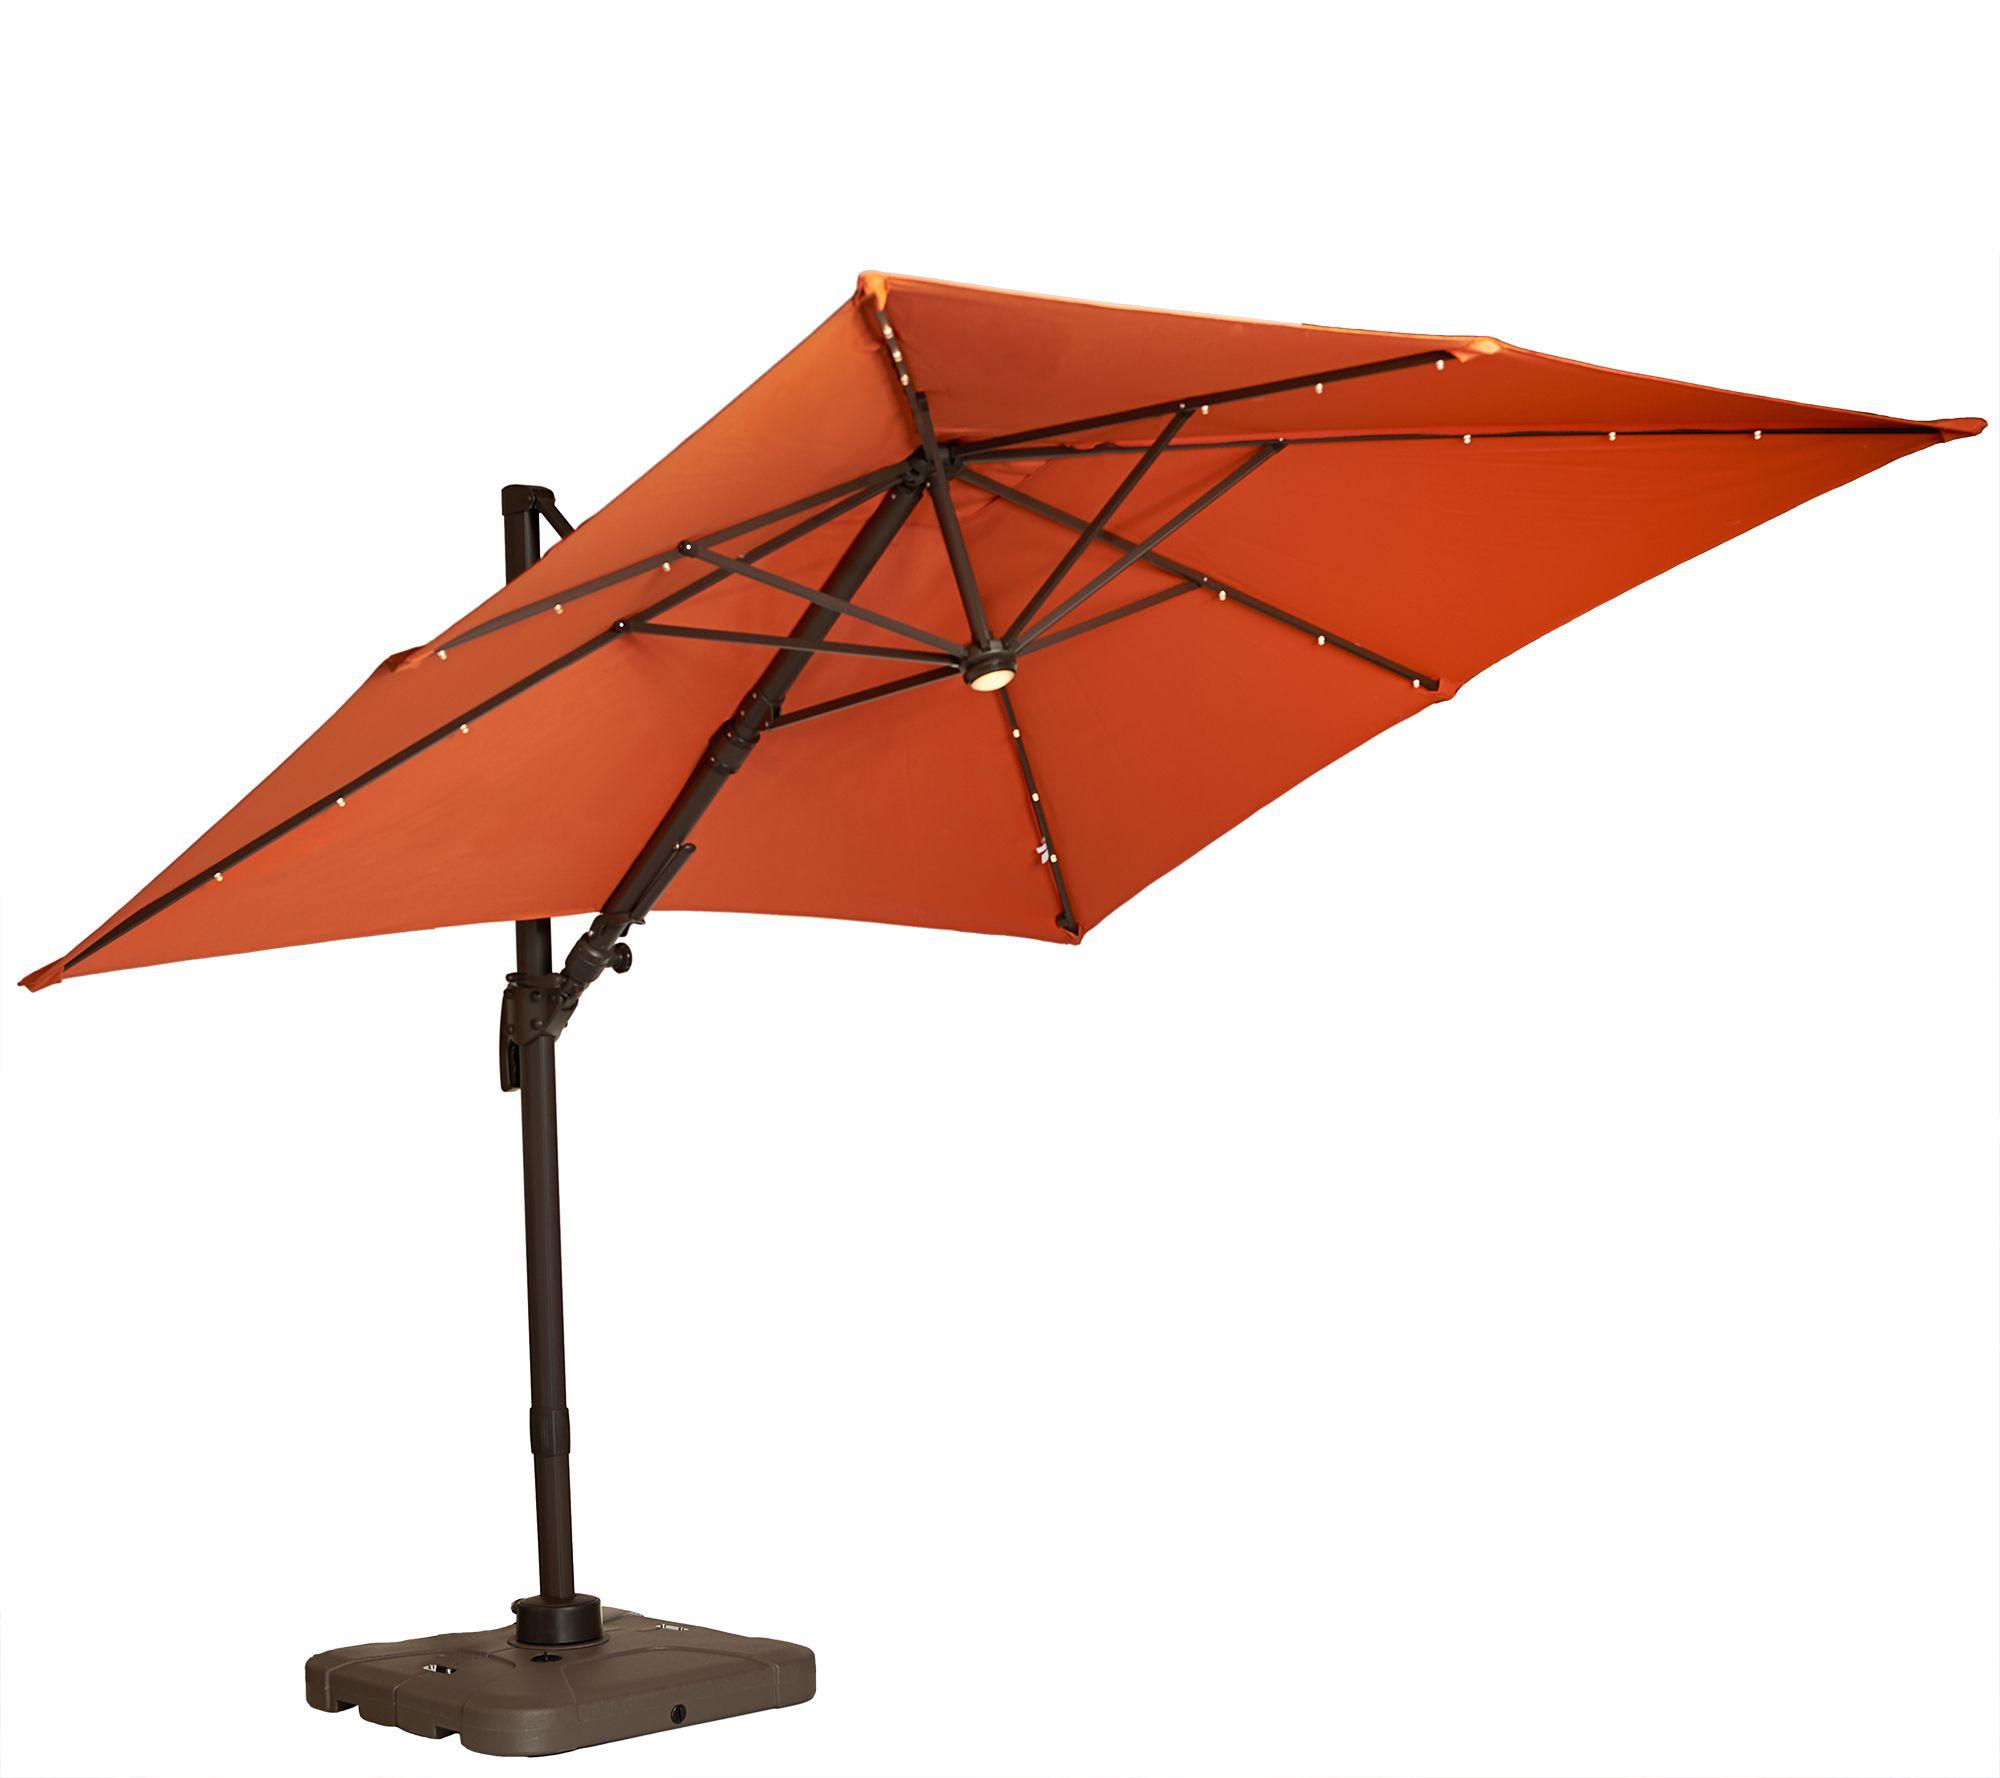 ATLeisure Multi Tilt 8 5 Solar fset Patio Umbrella Page 1